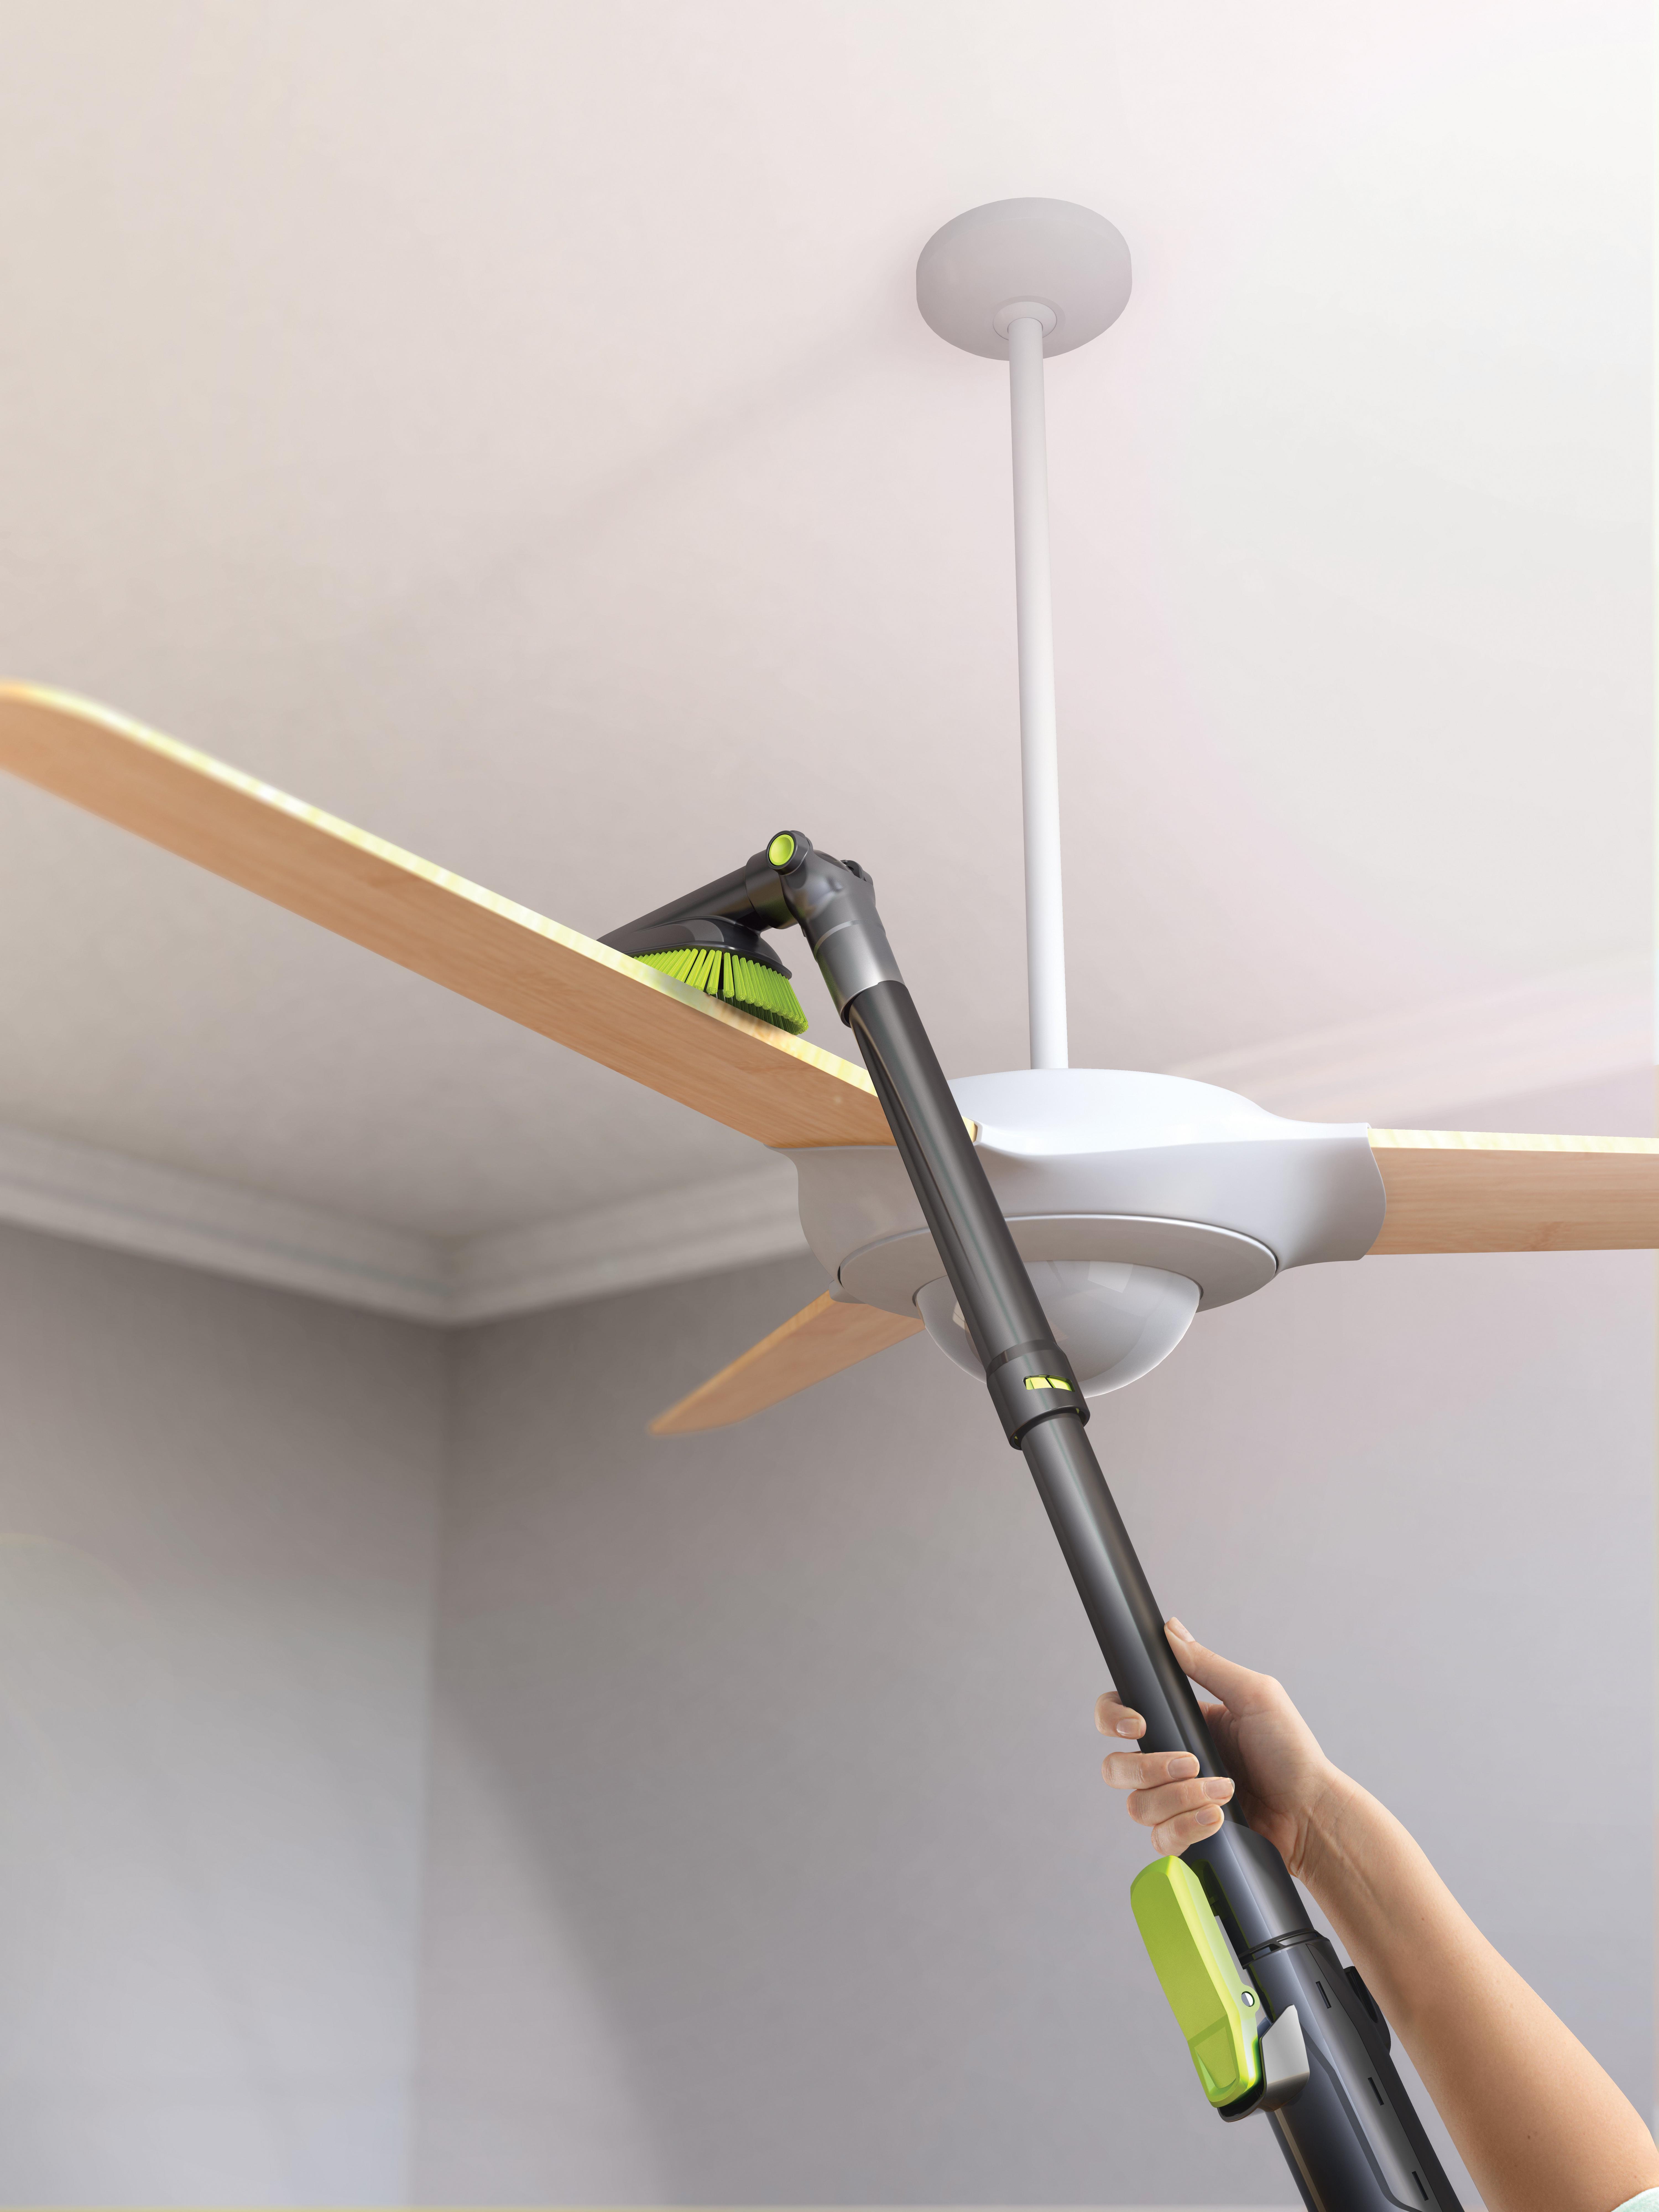 Air Lift Steerable Upright Vacuum5